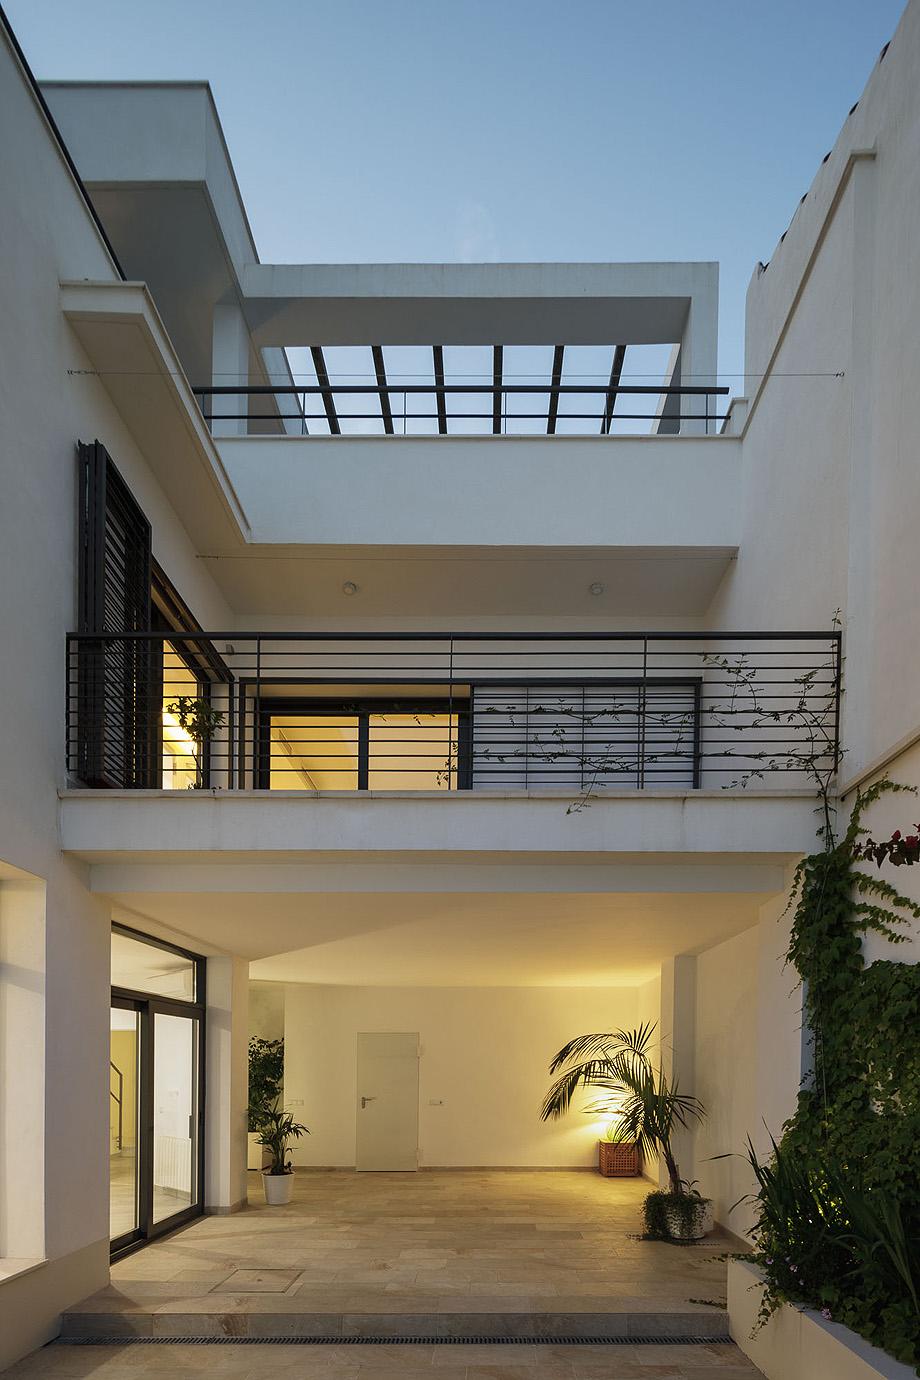 casa cr en sevilla de faq arquitectura - foto fernando alda (6)